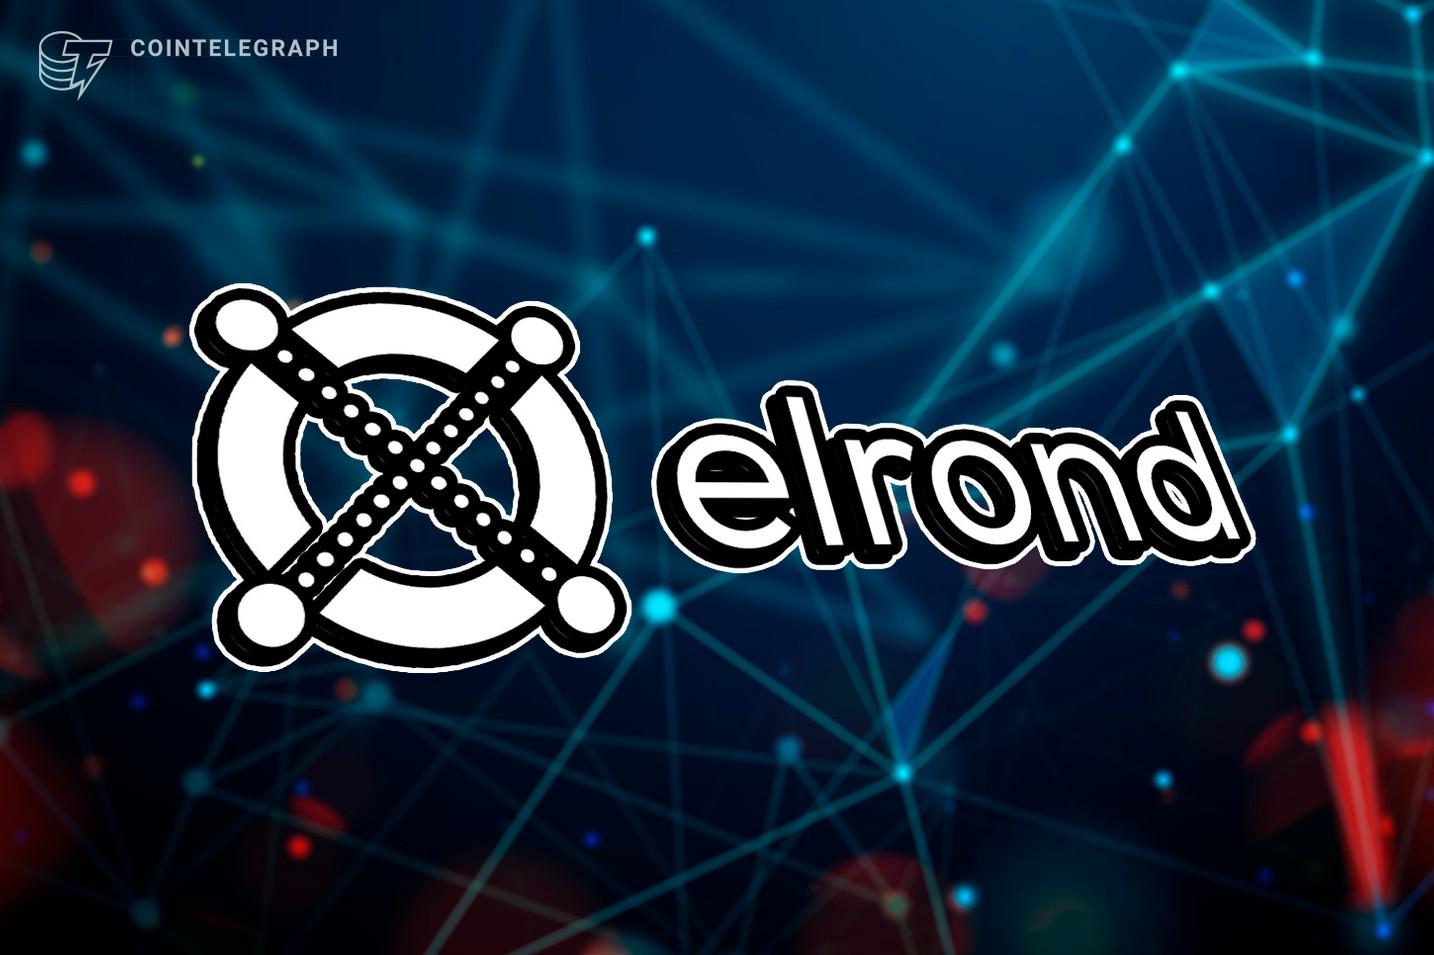 Özel Elrond Raporu: Elrond (EGLD) ekosistemi hızla büyüyor